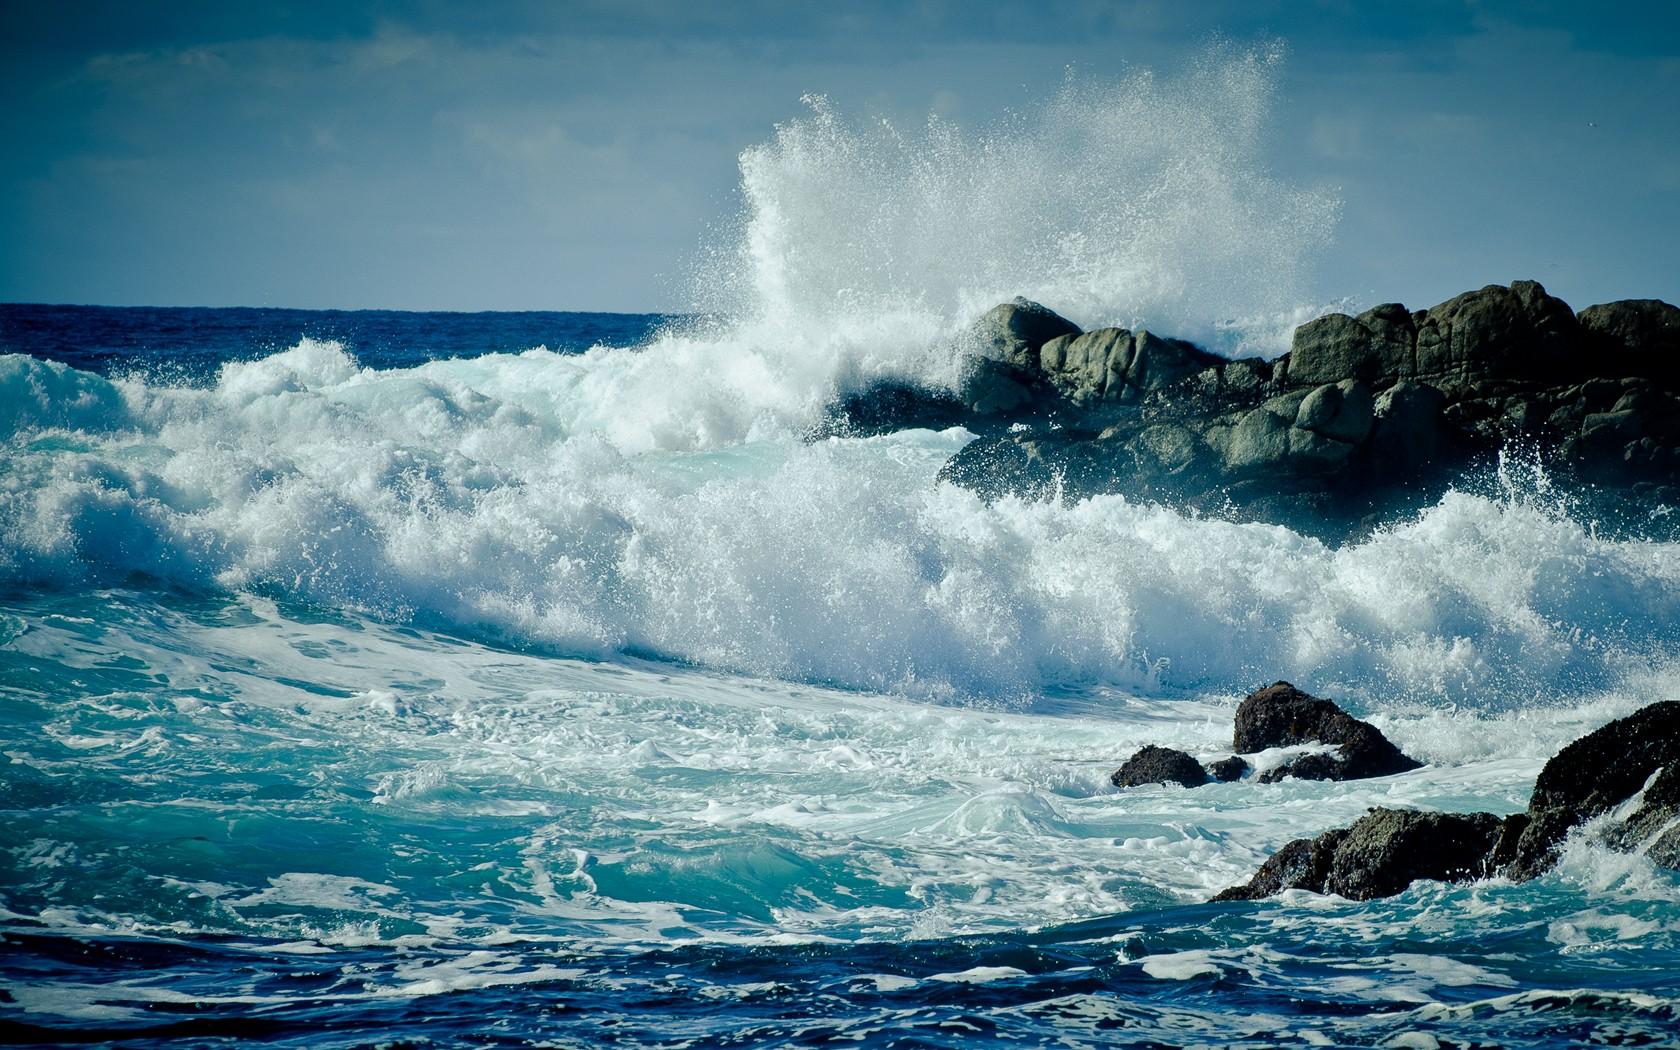 Wallpaper Sports Sea Rock Nature Shore Beach Waves